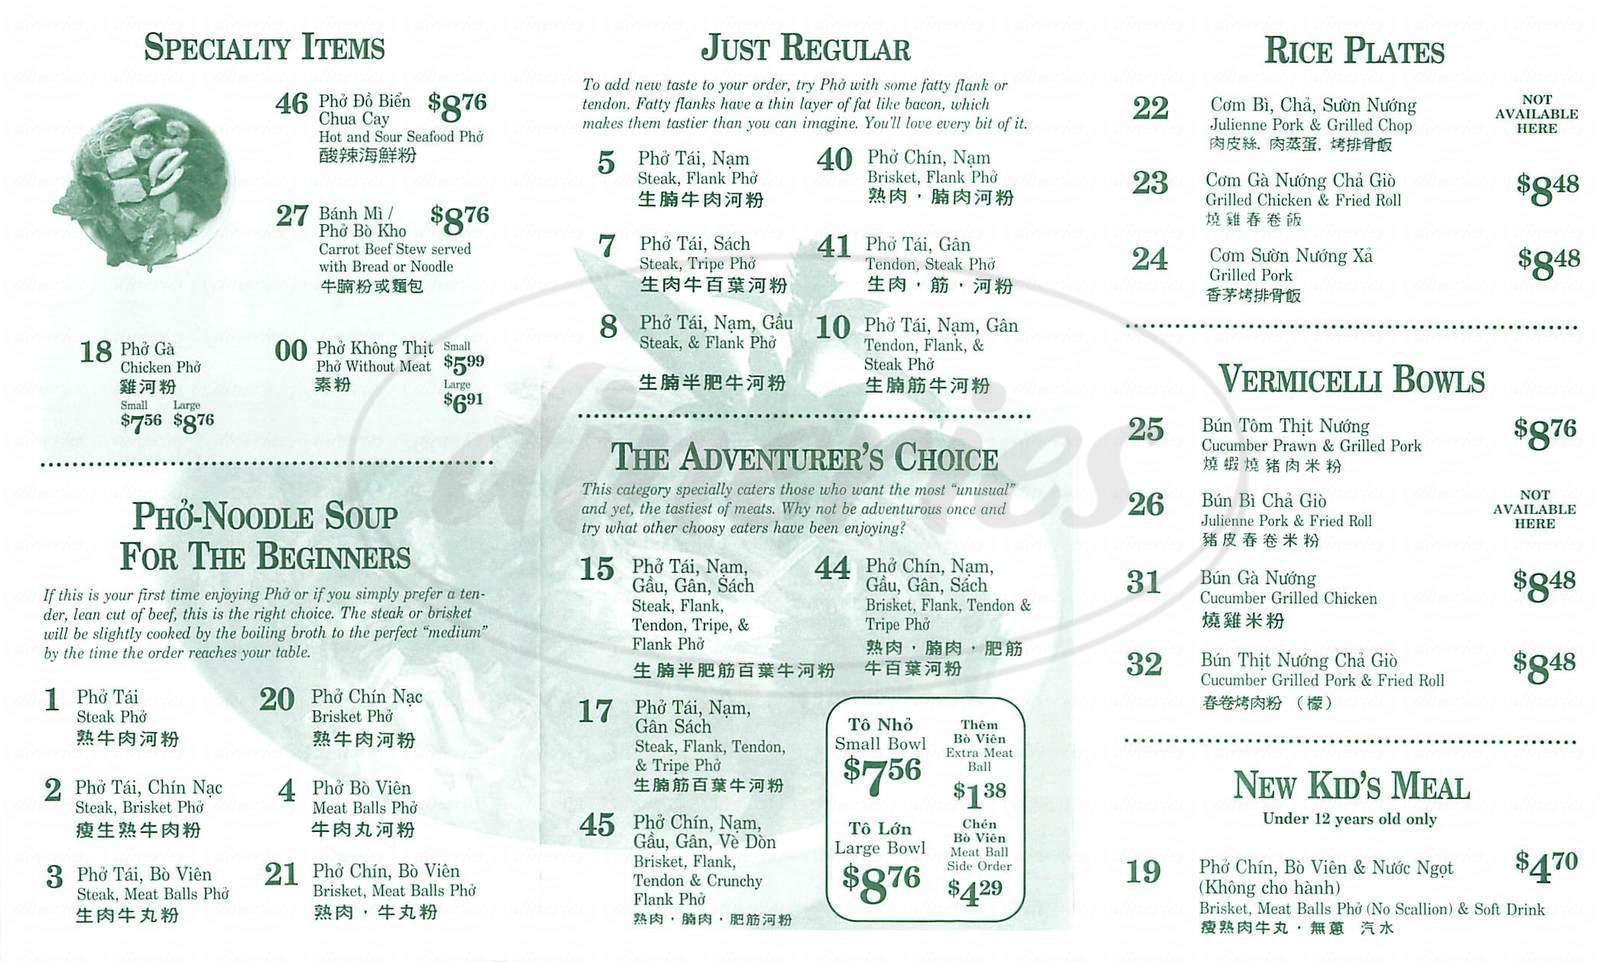 menu for Pho Hoa Noodle Soup